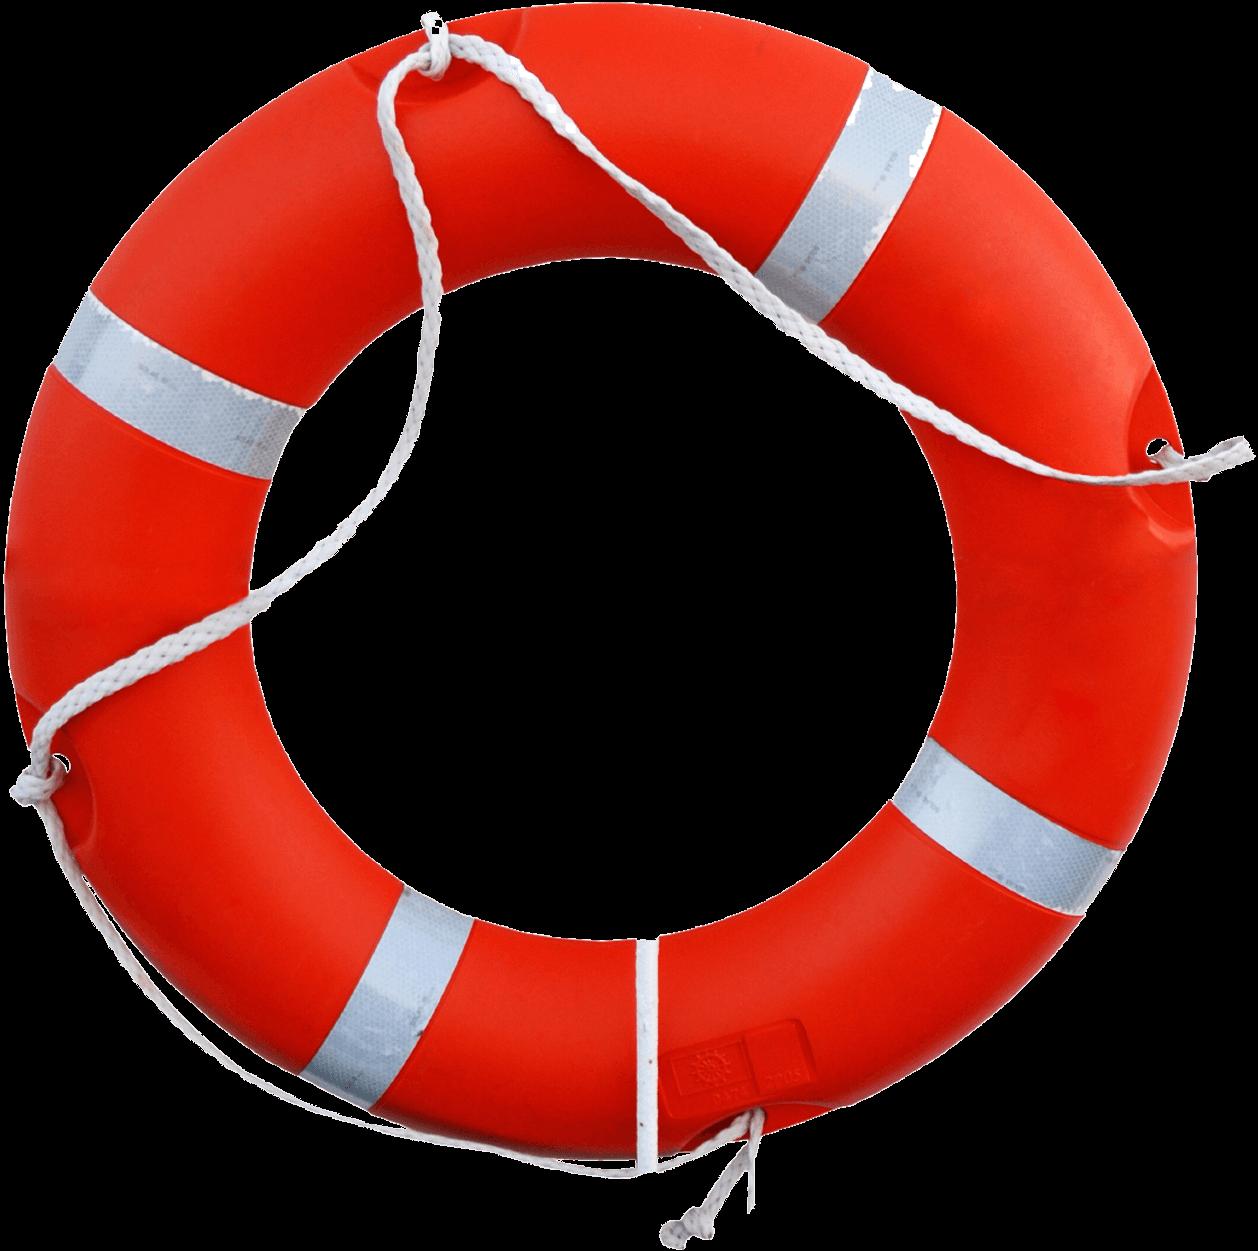 1258x1251 Lifesavers Cliparts 227775